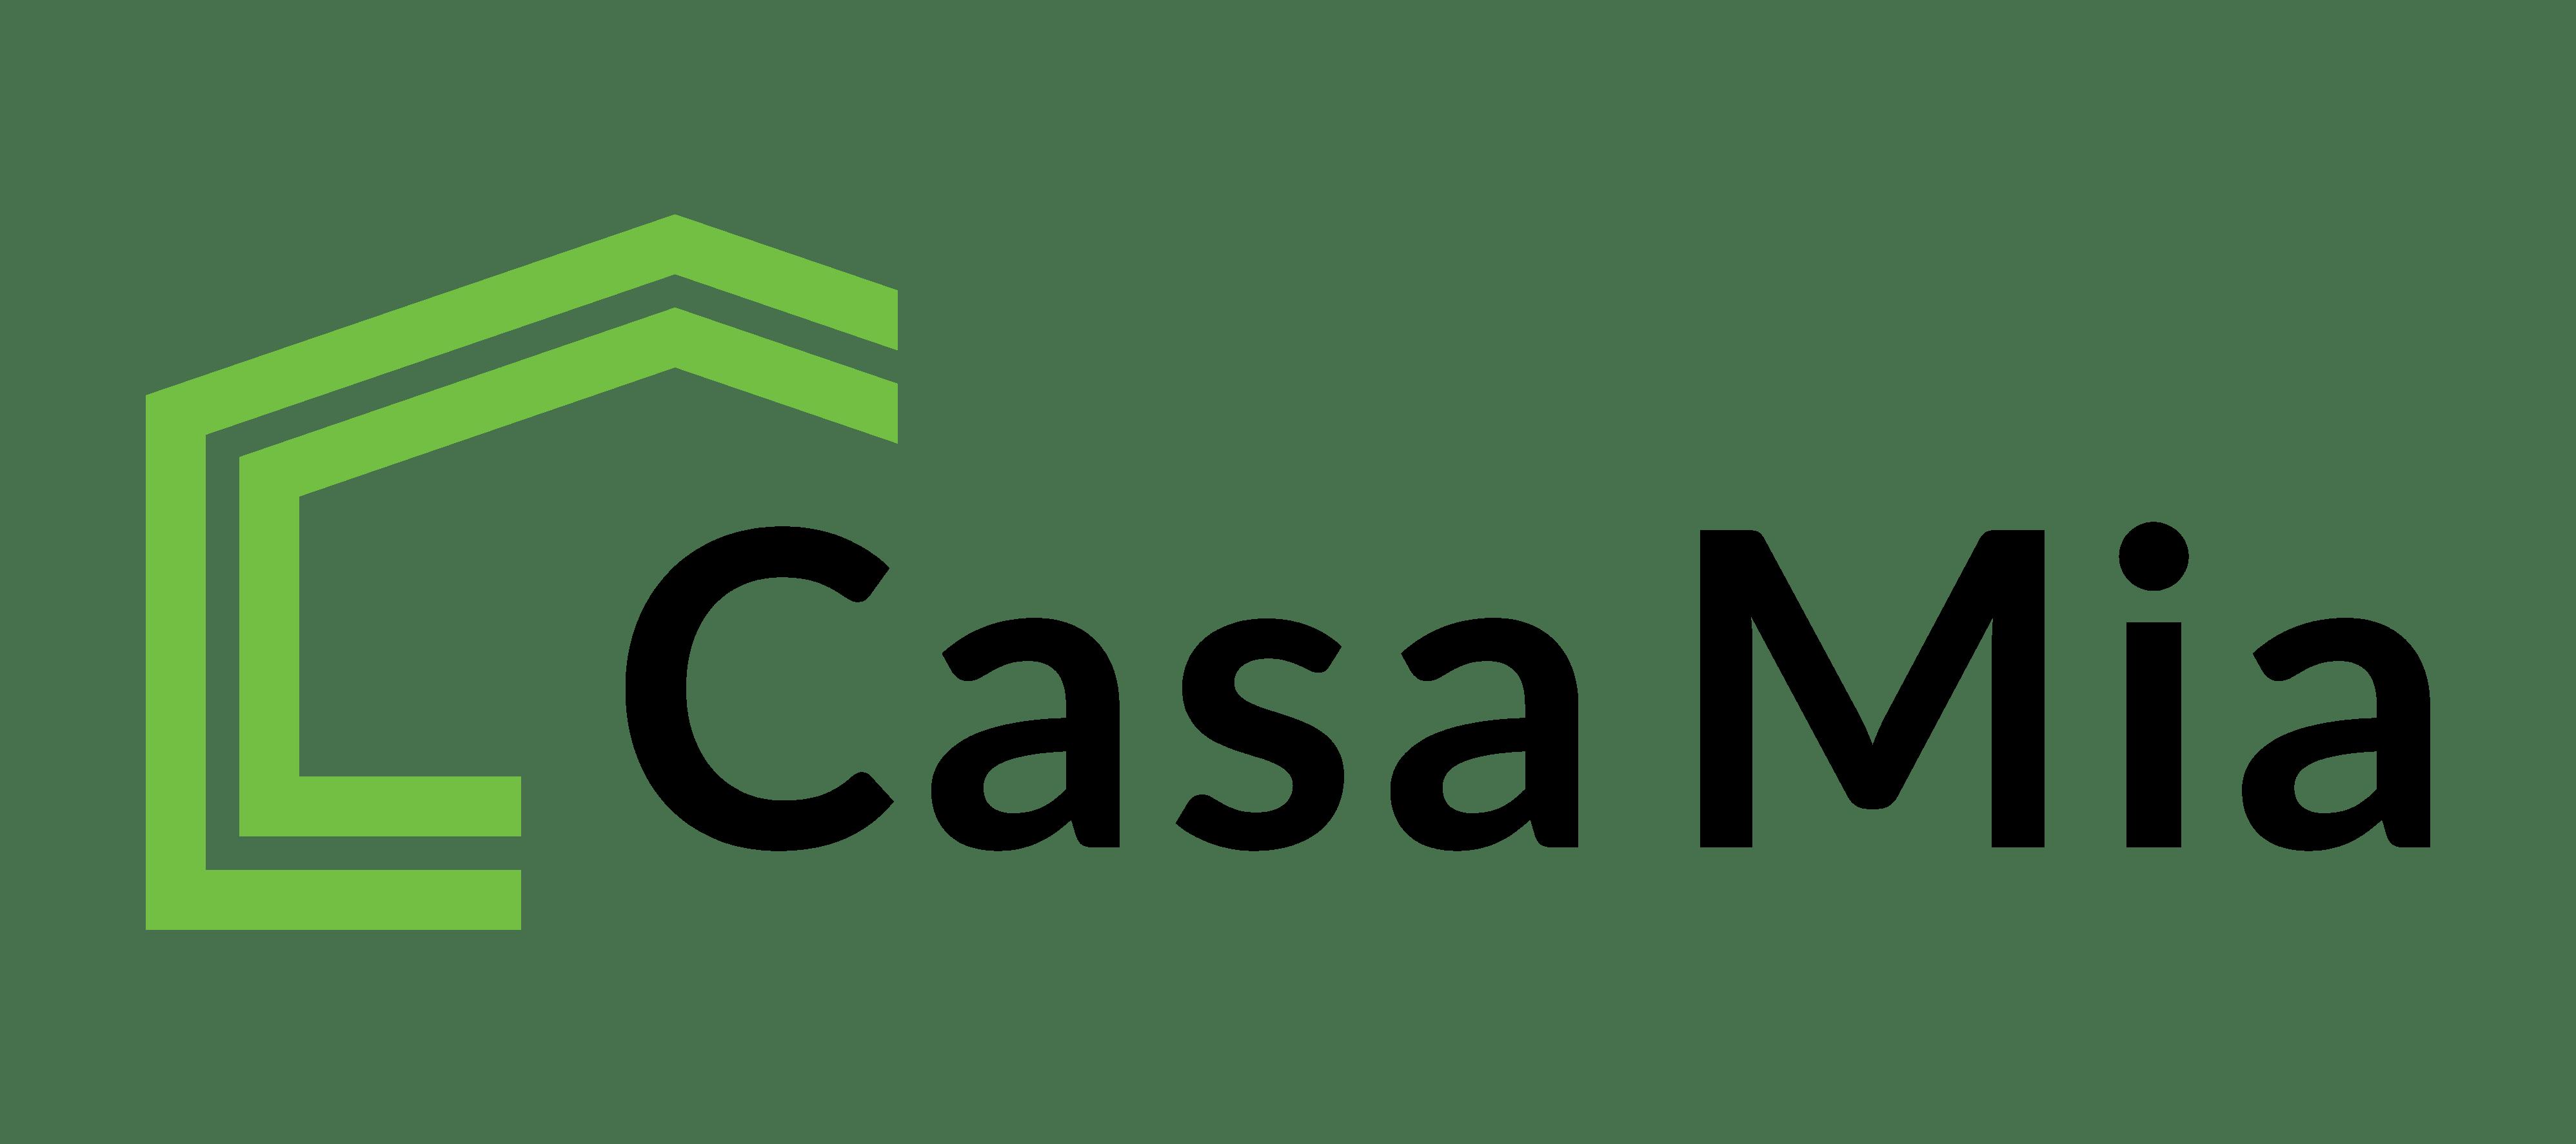 Casa Mia Coliving logo